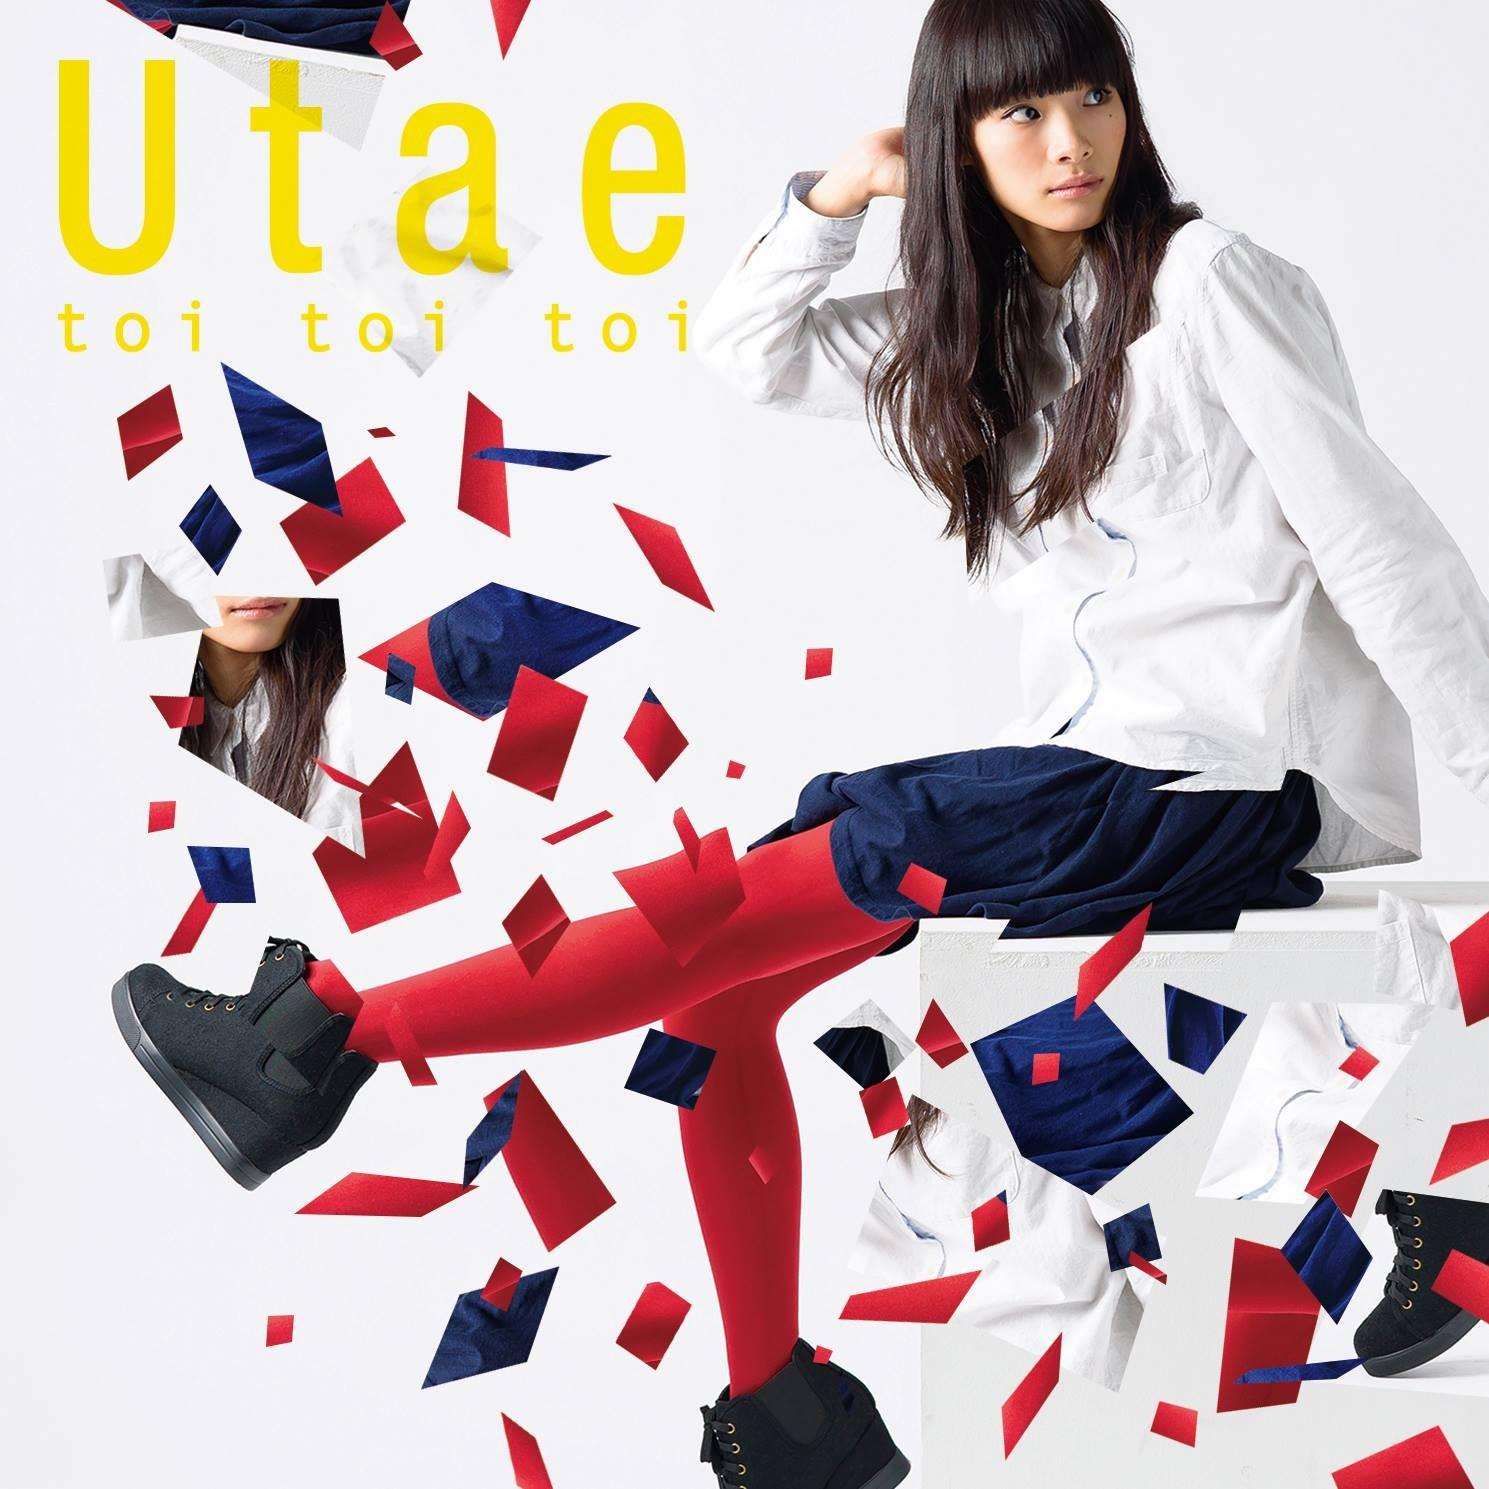 20160329.22.14 Utae - toi toi toi cover.jpg